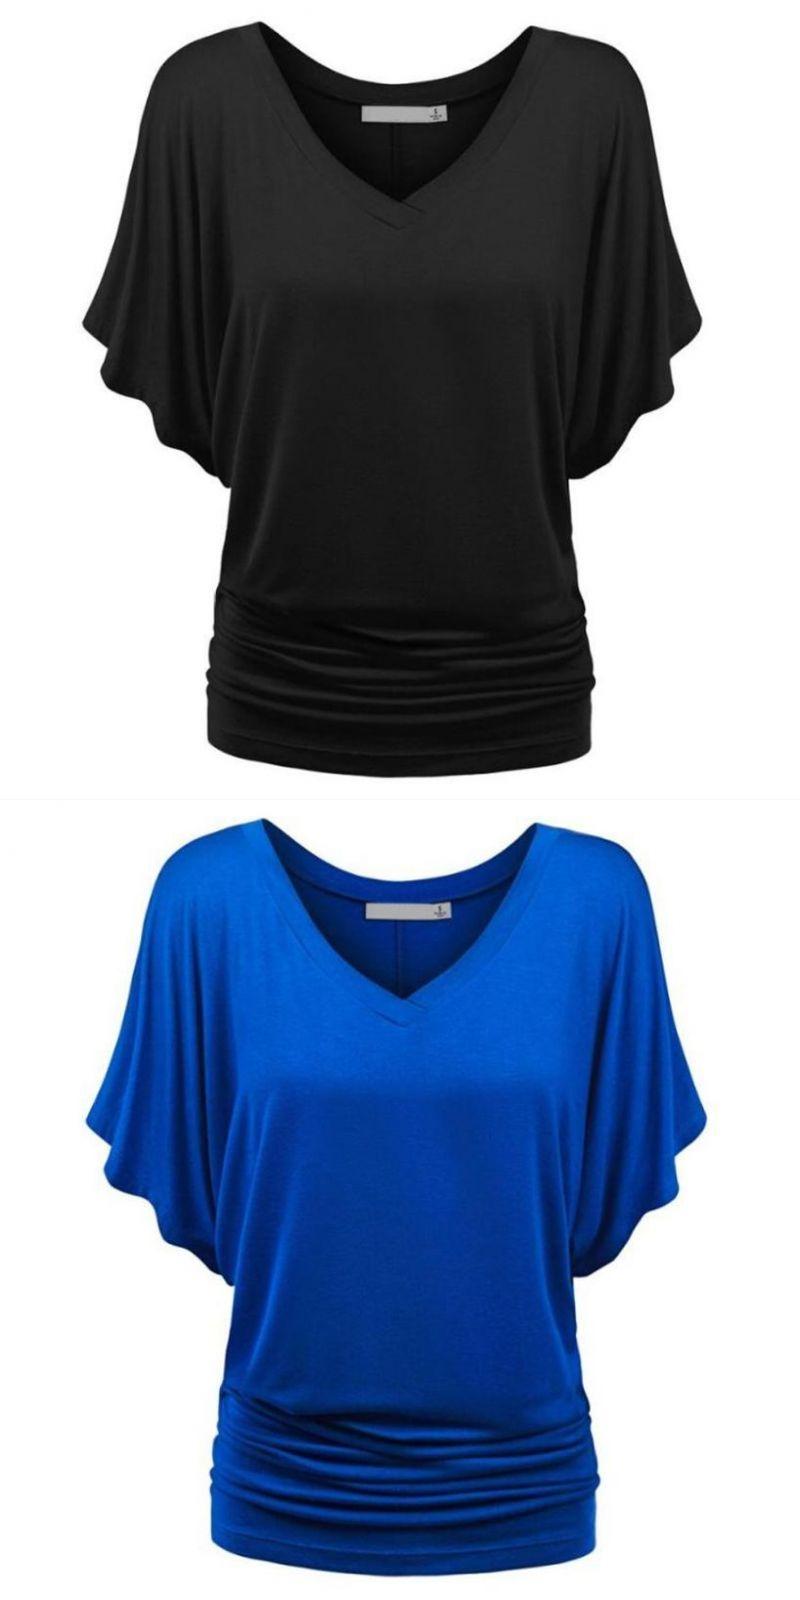 4a130b1b7c Summer tops for women 2018 fashion sexy women solid causel t-shirt top deep  v